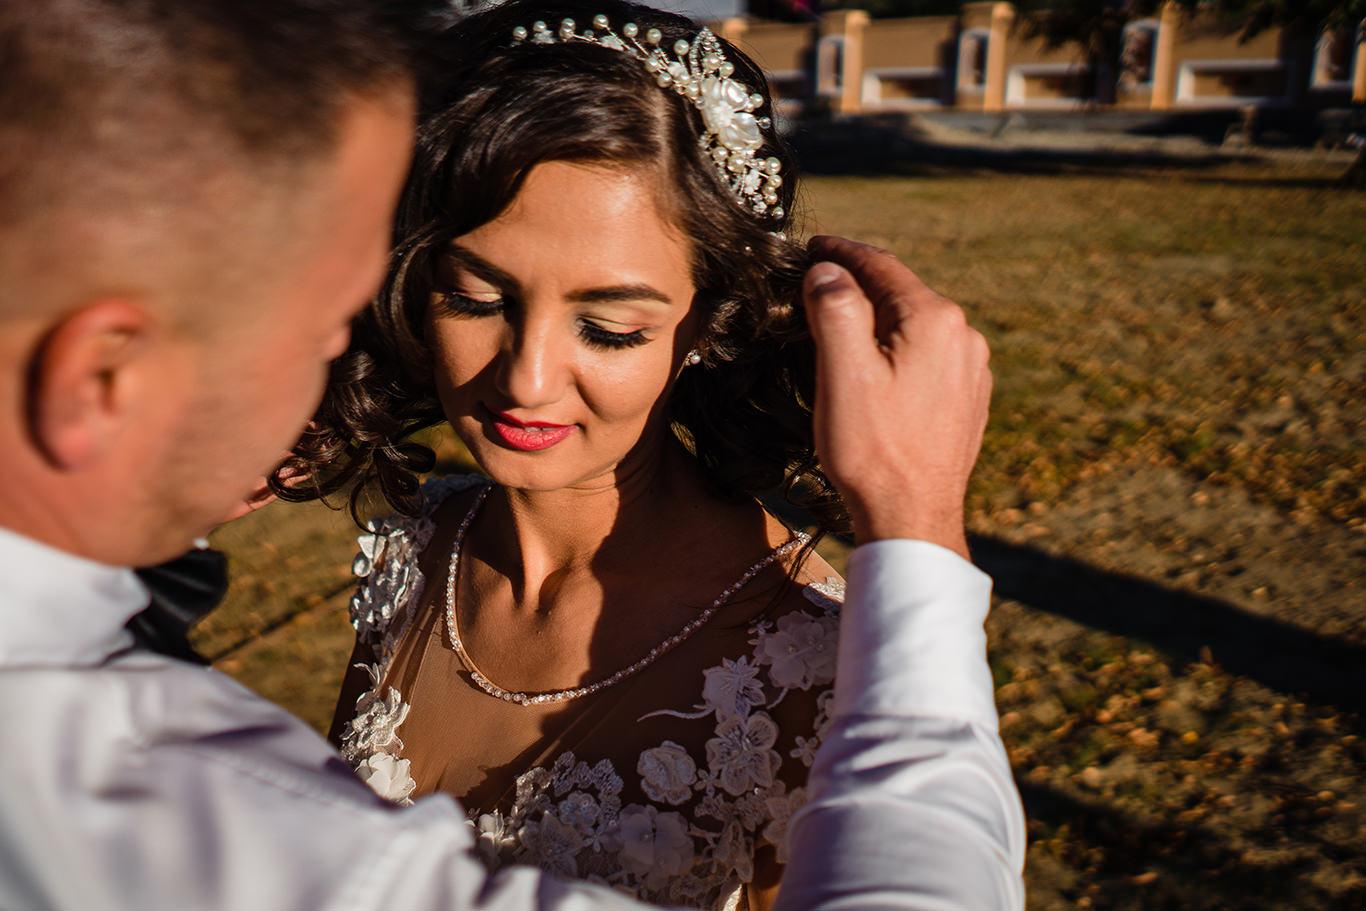 Iubire - nunta La Belle Epoque